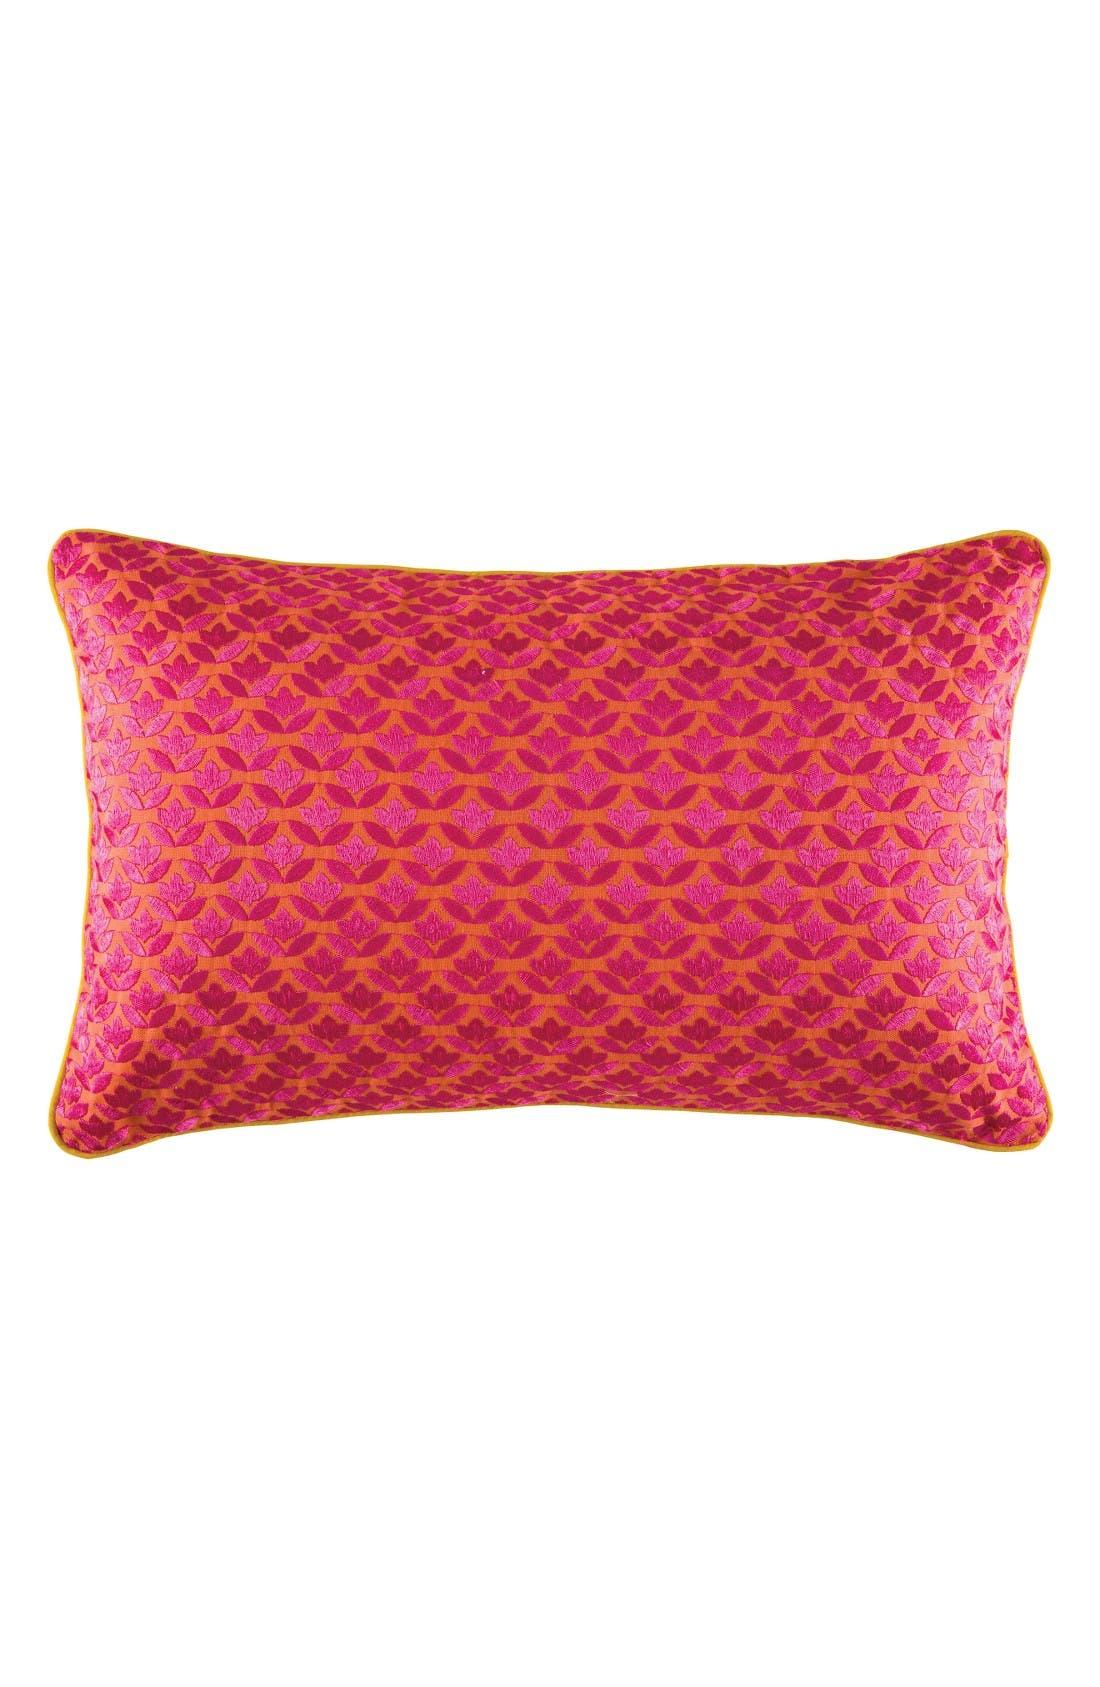 Main Image - KAS Designs Manasi Pillow